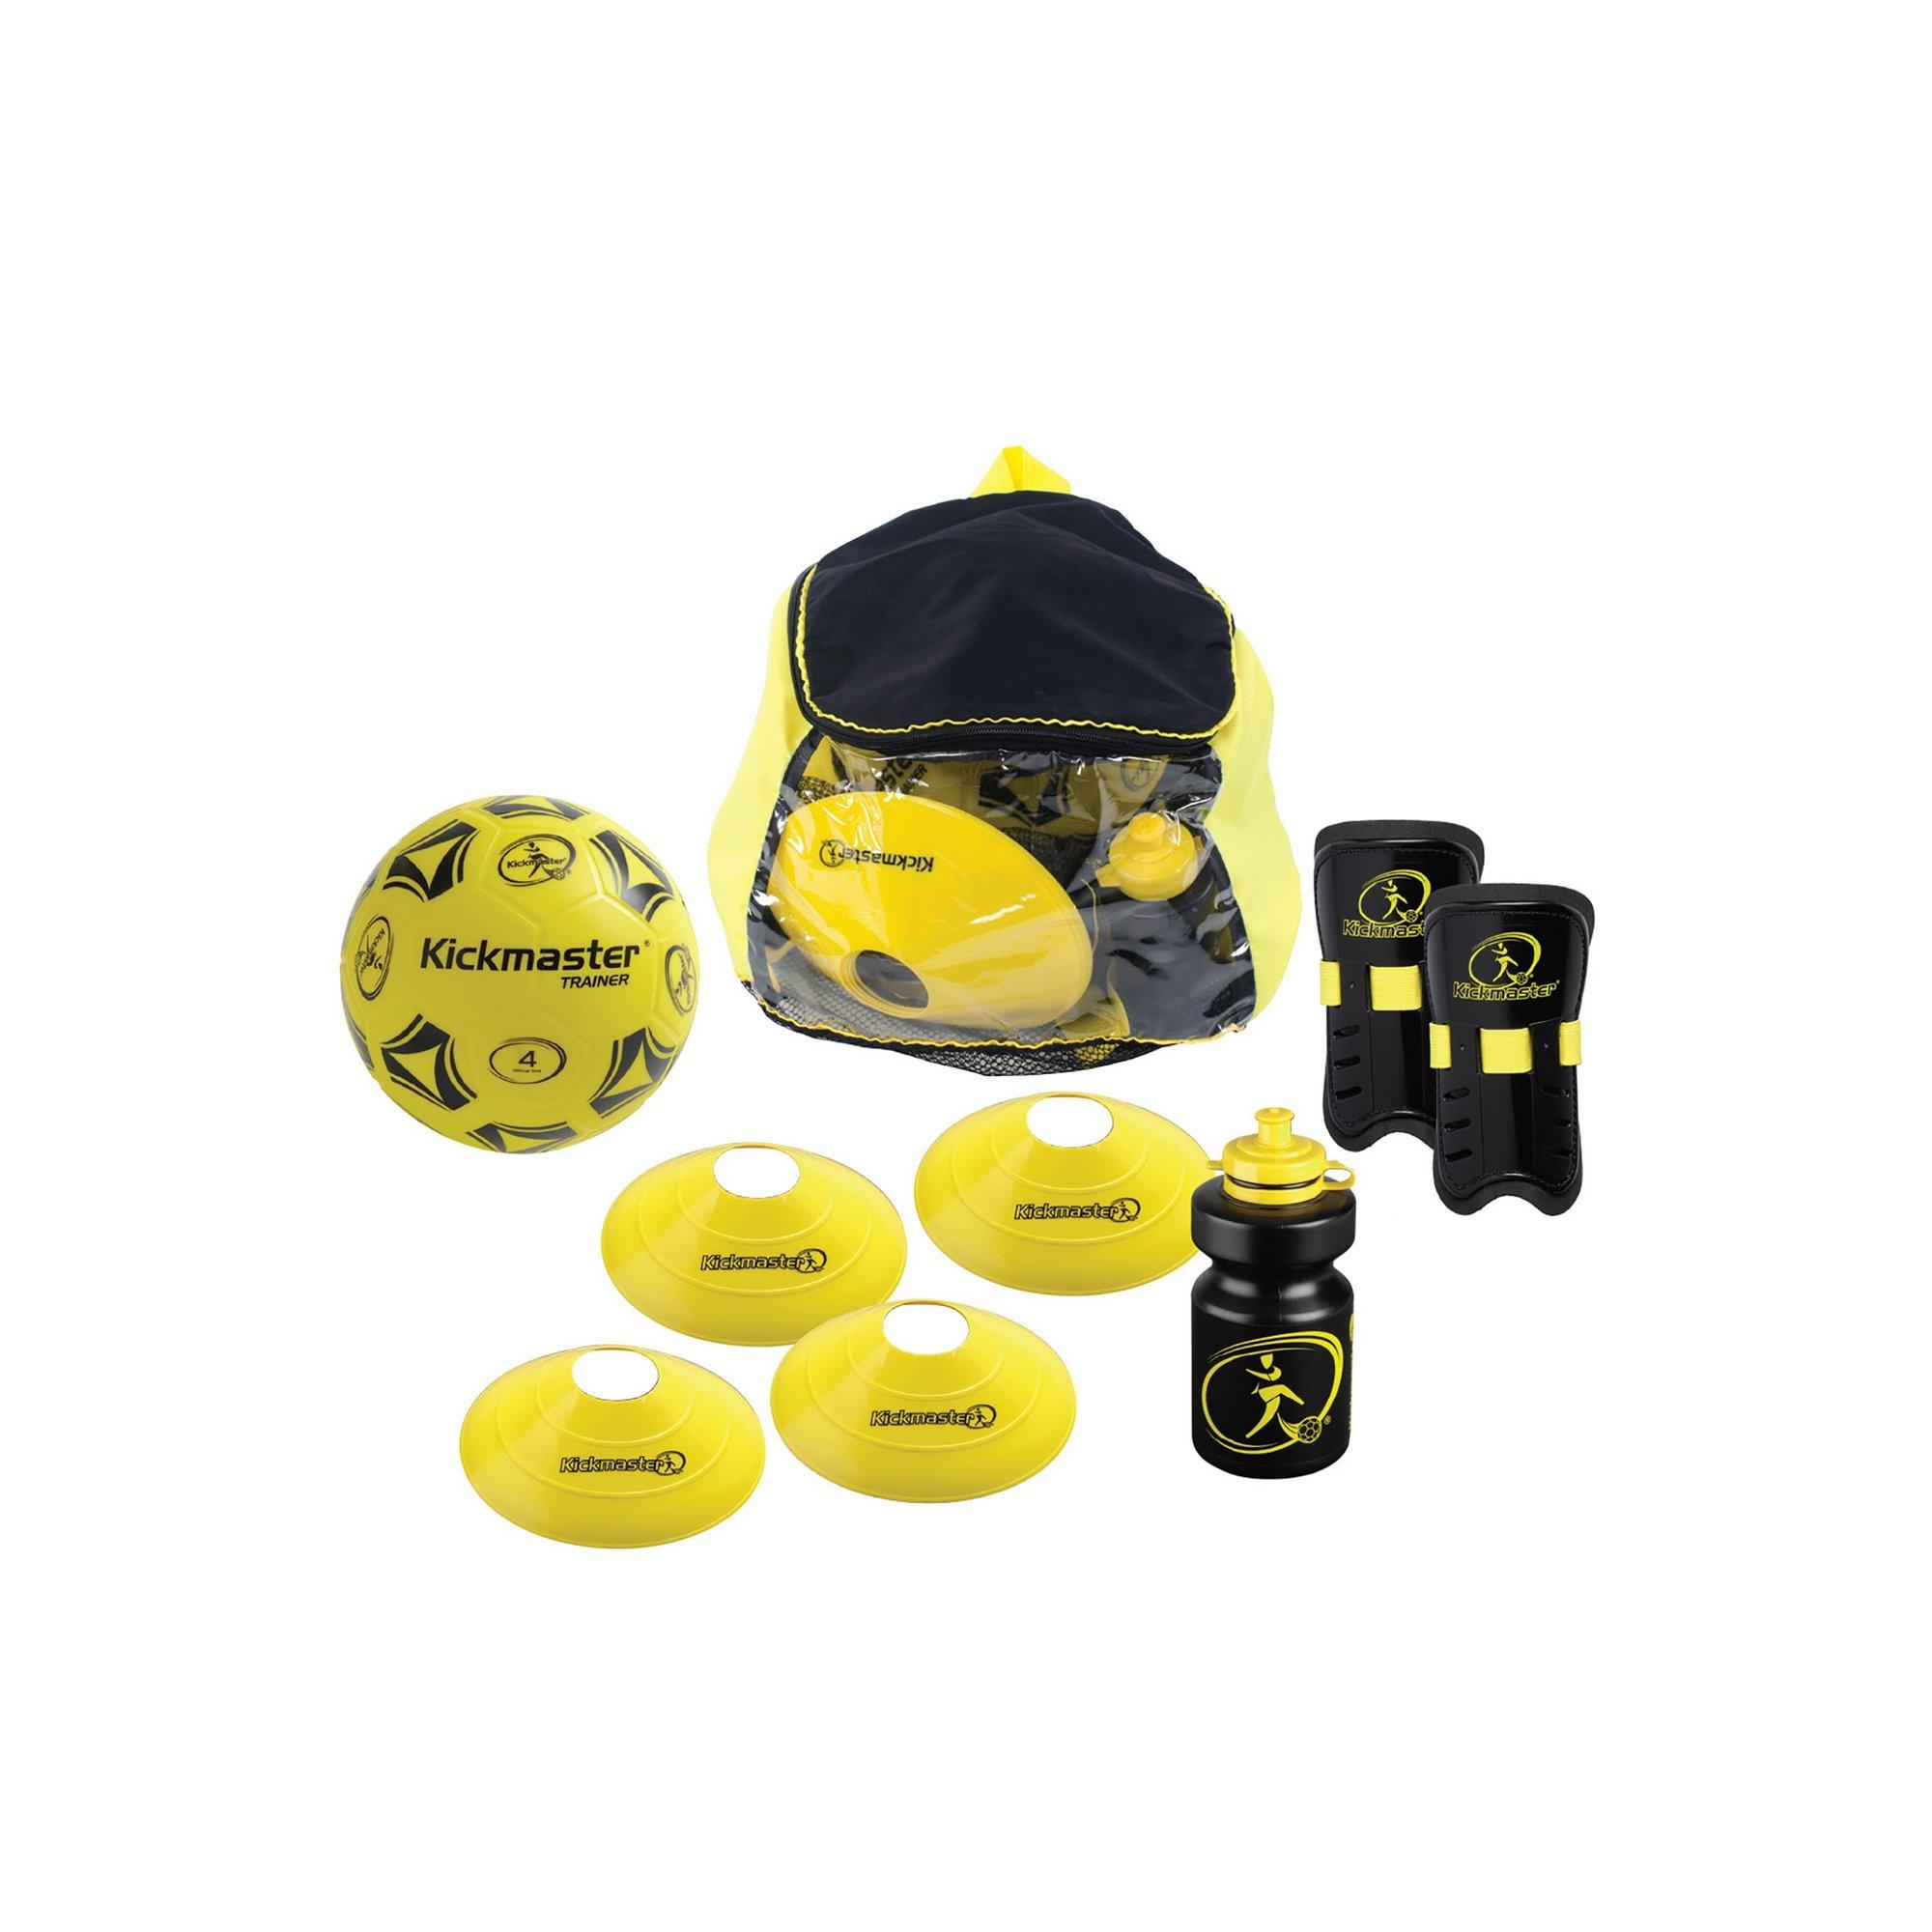 Image of Kickmaster Backpack Training Set